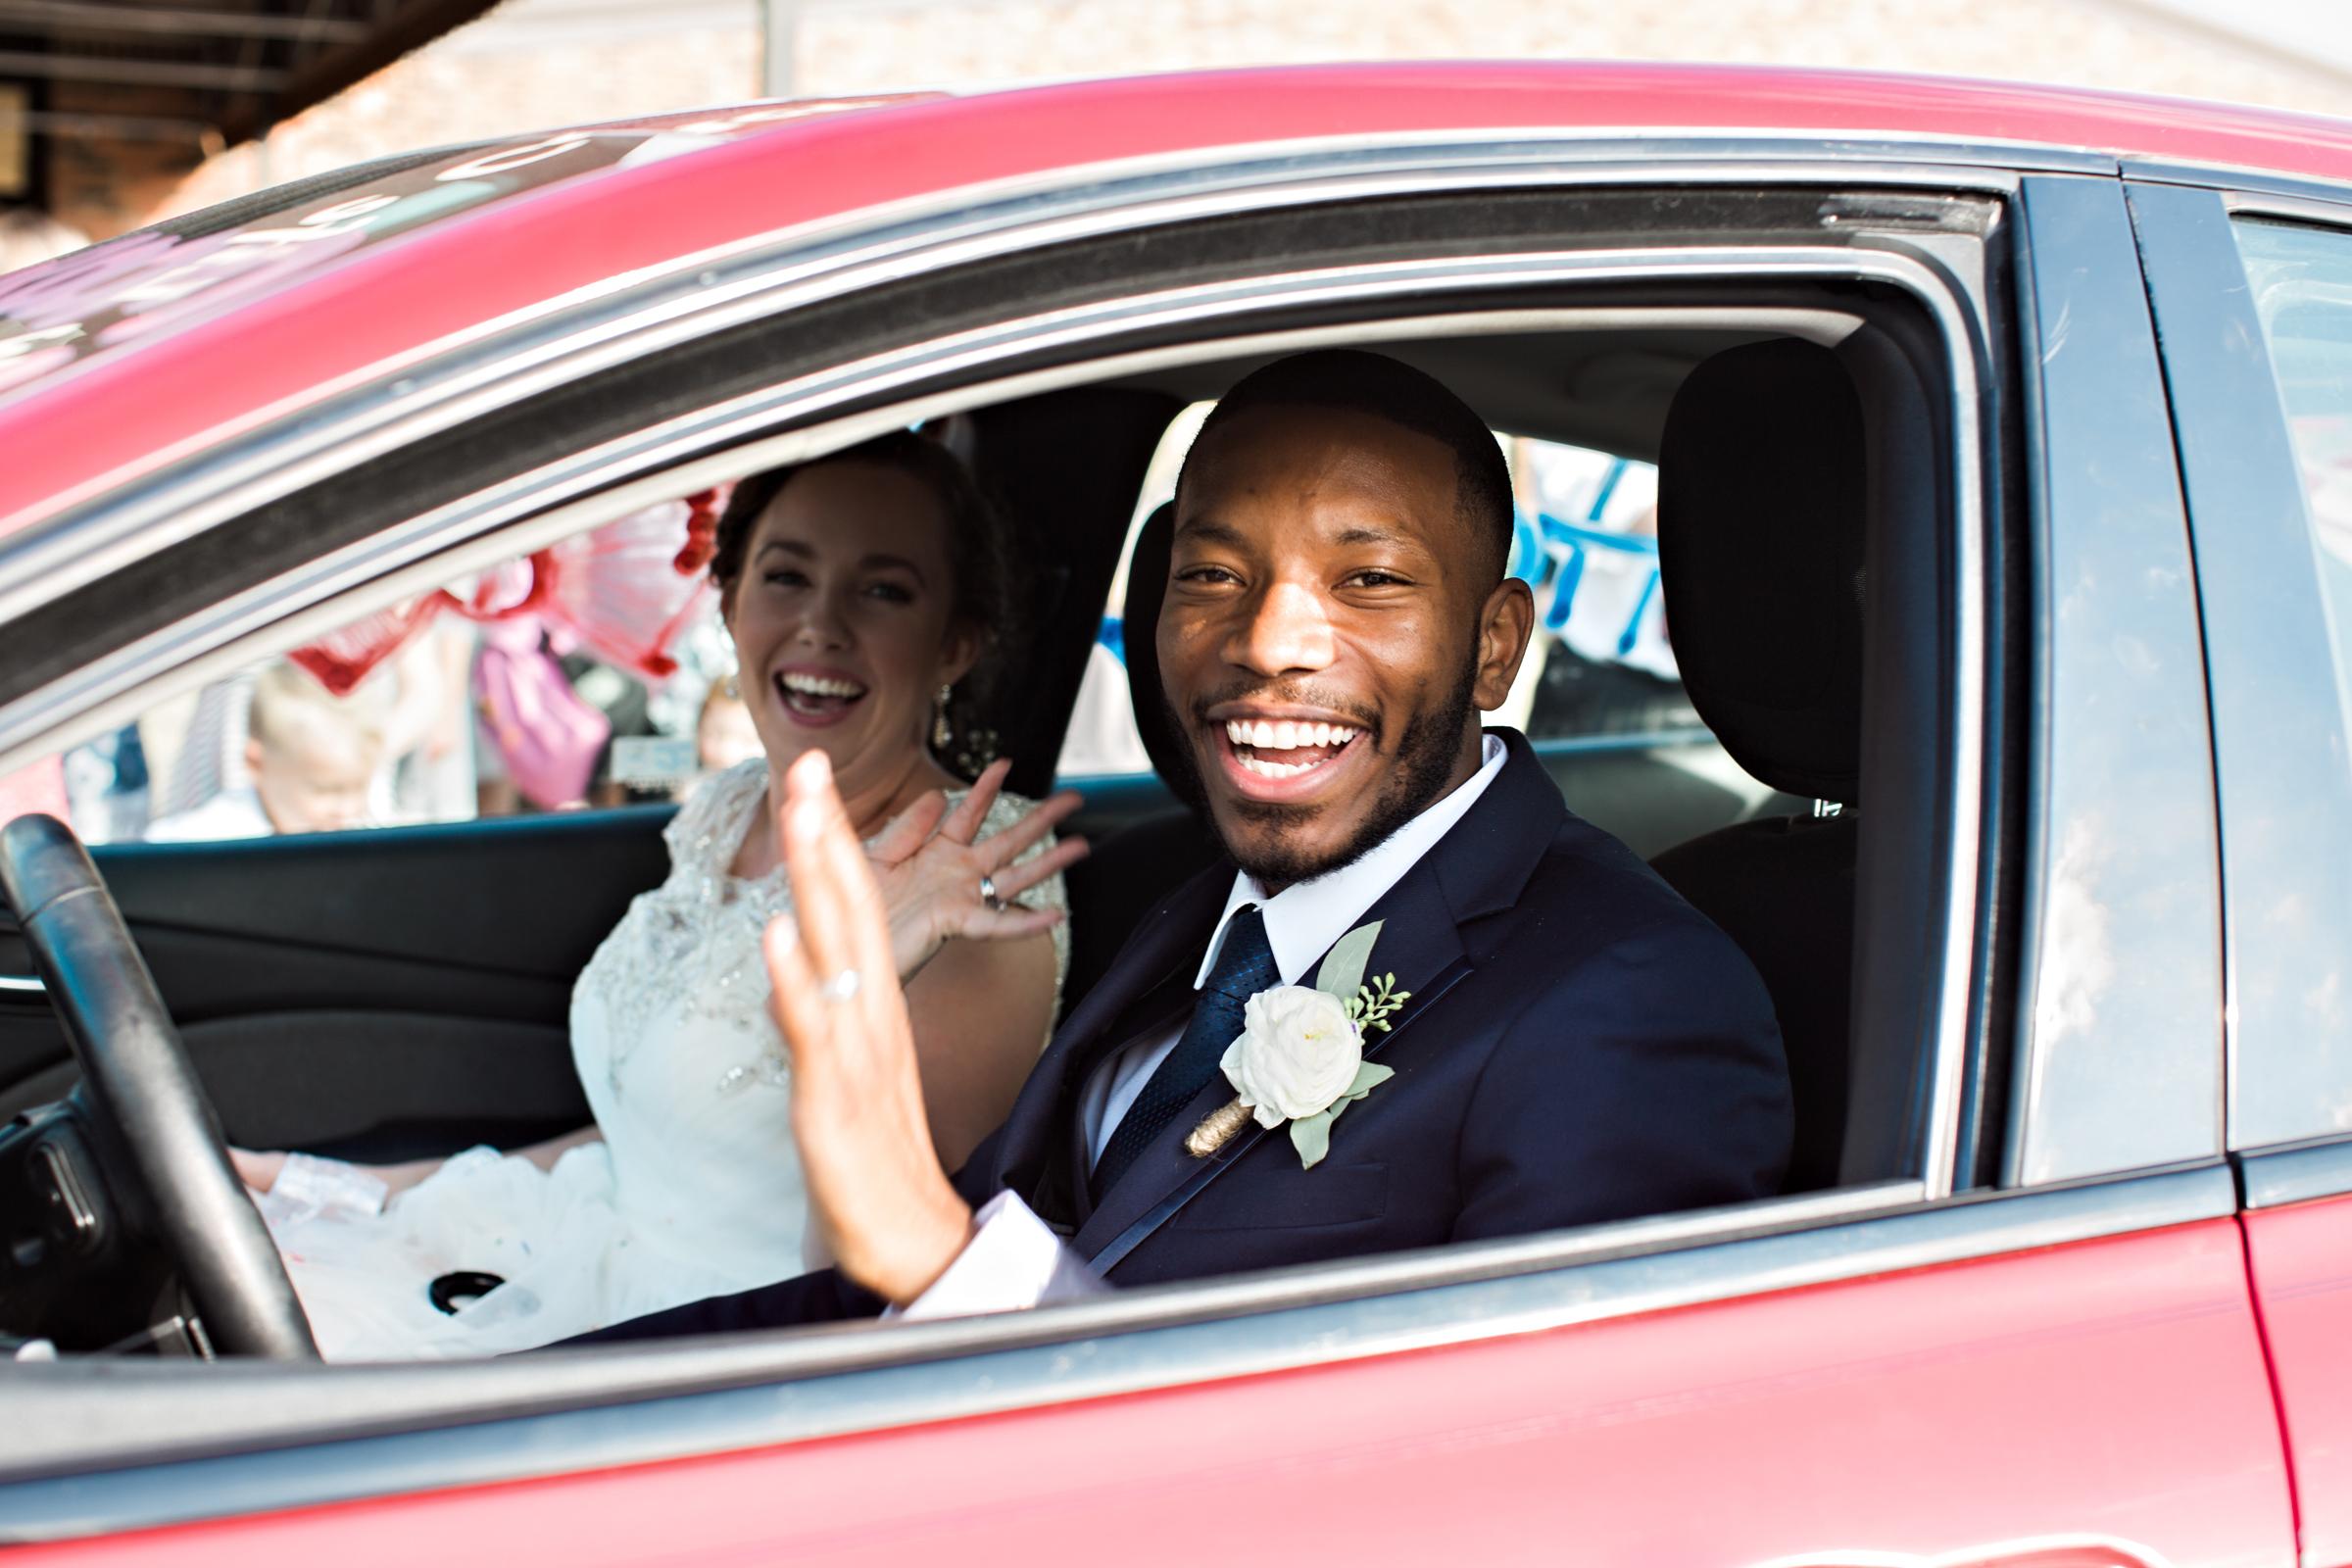 Alabama-Wedding-Photography-Nick-Drollette-Cory-Laura-149.jpg